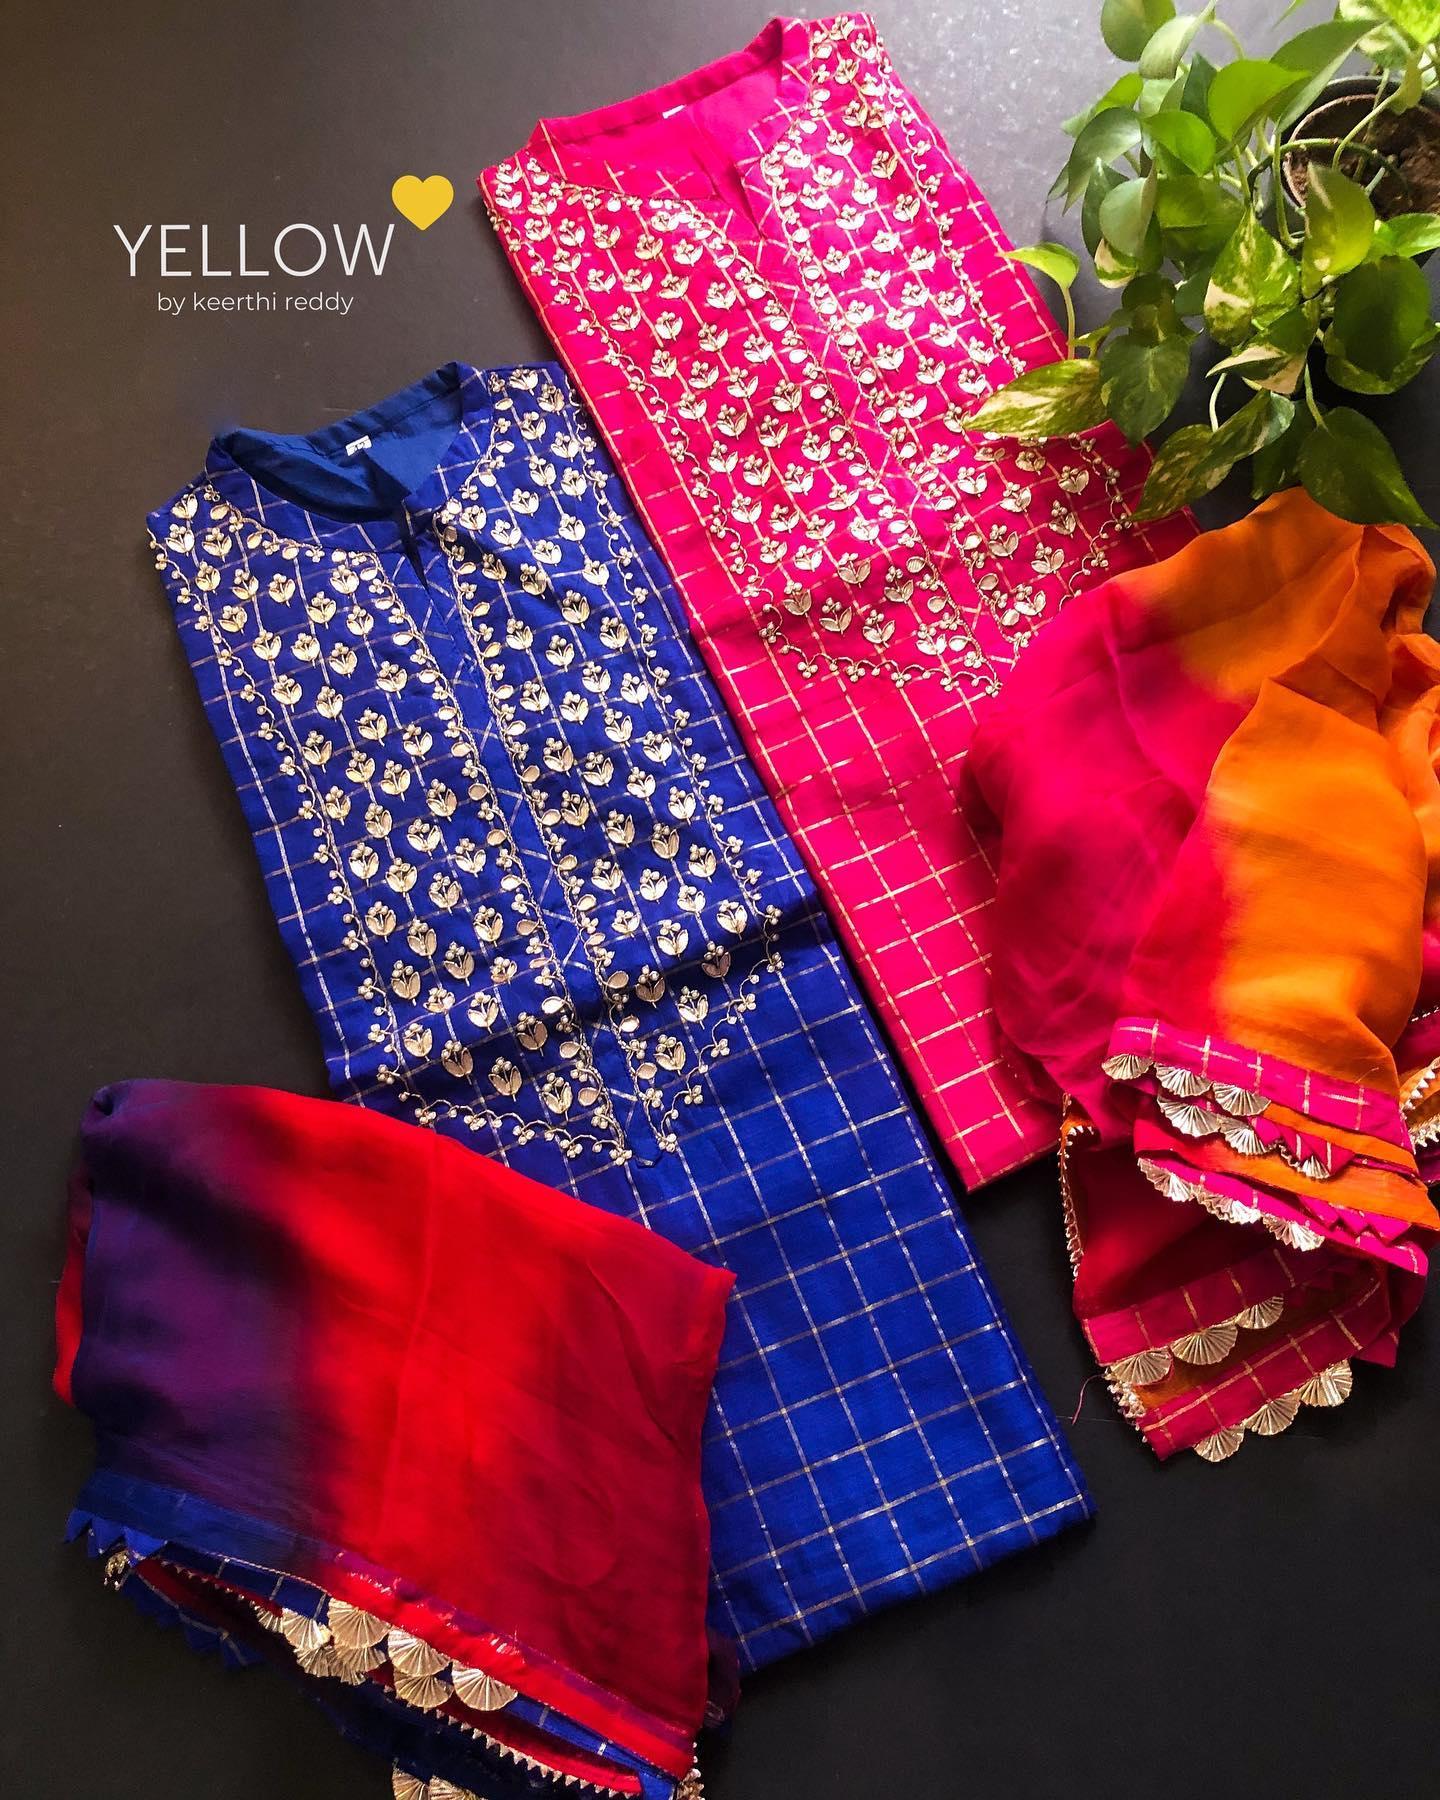 BRIGHT SIDE #2  Chanderi checks kurti with heavy gota work yoke paired up with dual shaded chiffon dupatta and gota trims.  Size - L  XL XXL Kindly WhatsApp  @ 7995038888 for enquiries. 2021-04-25